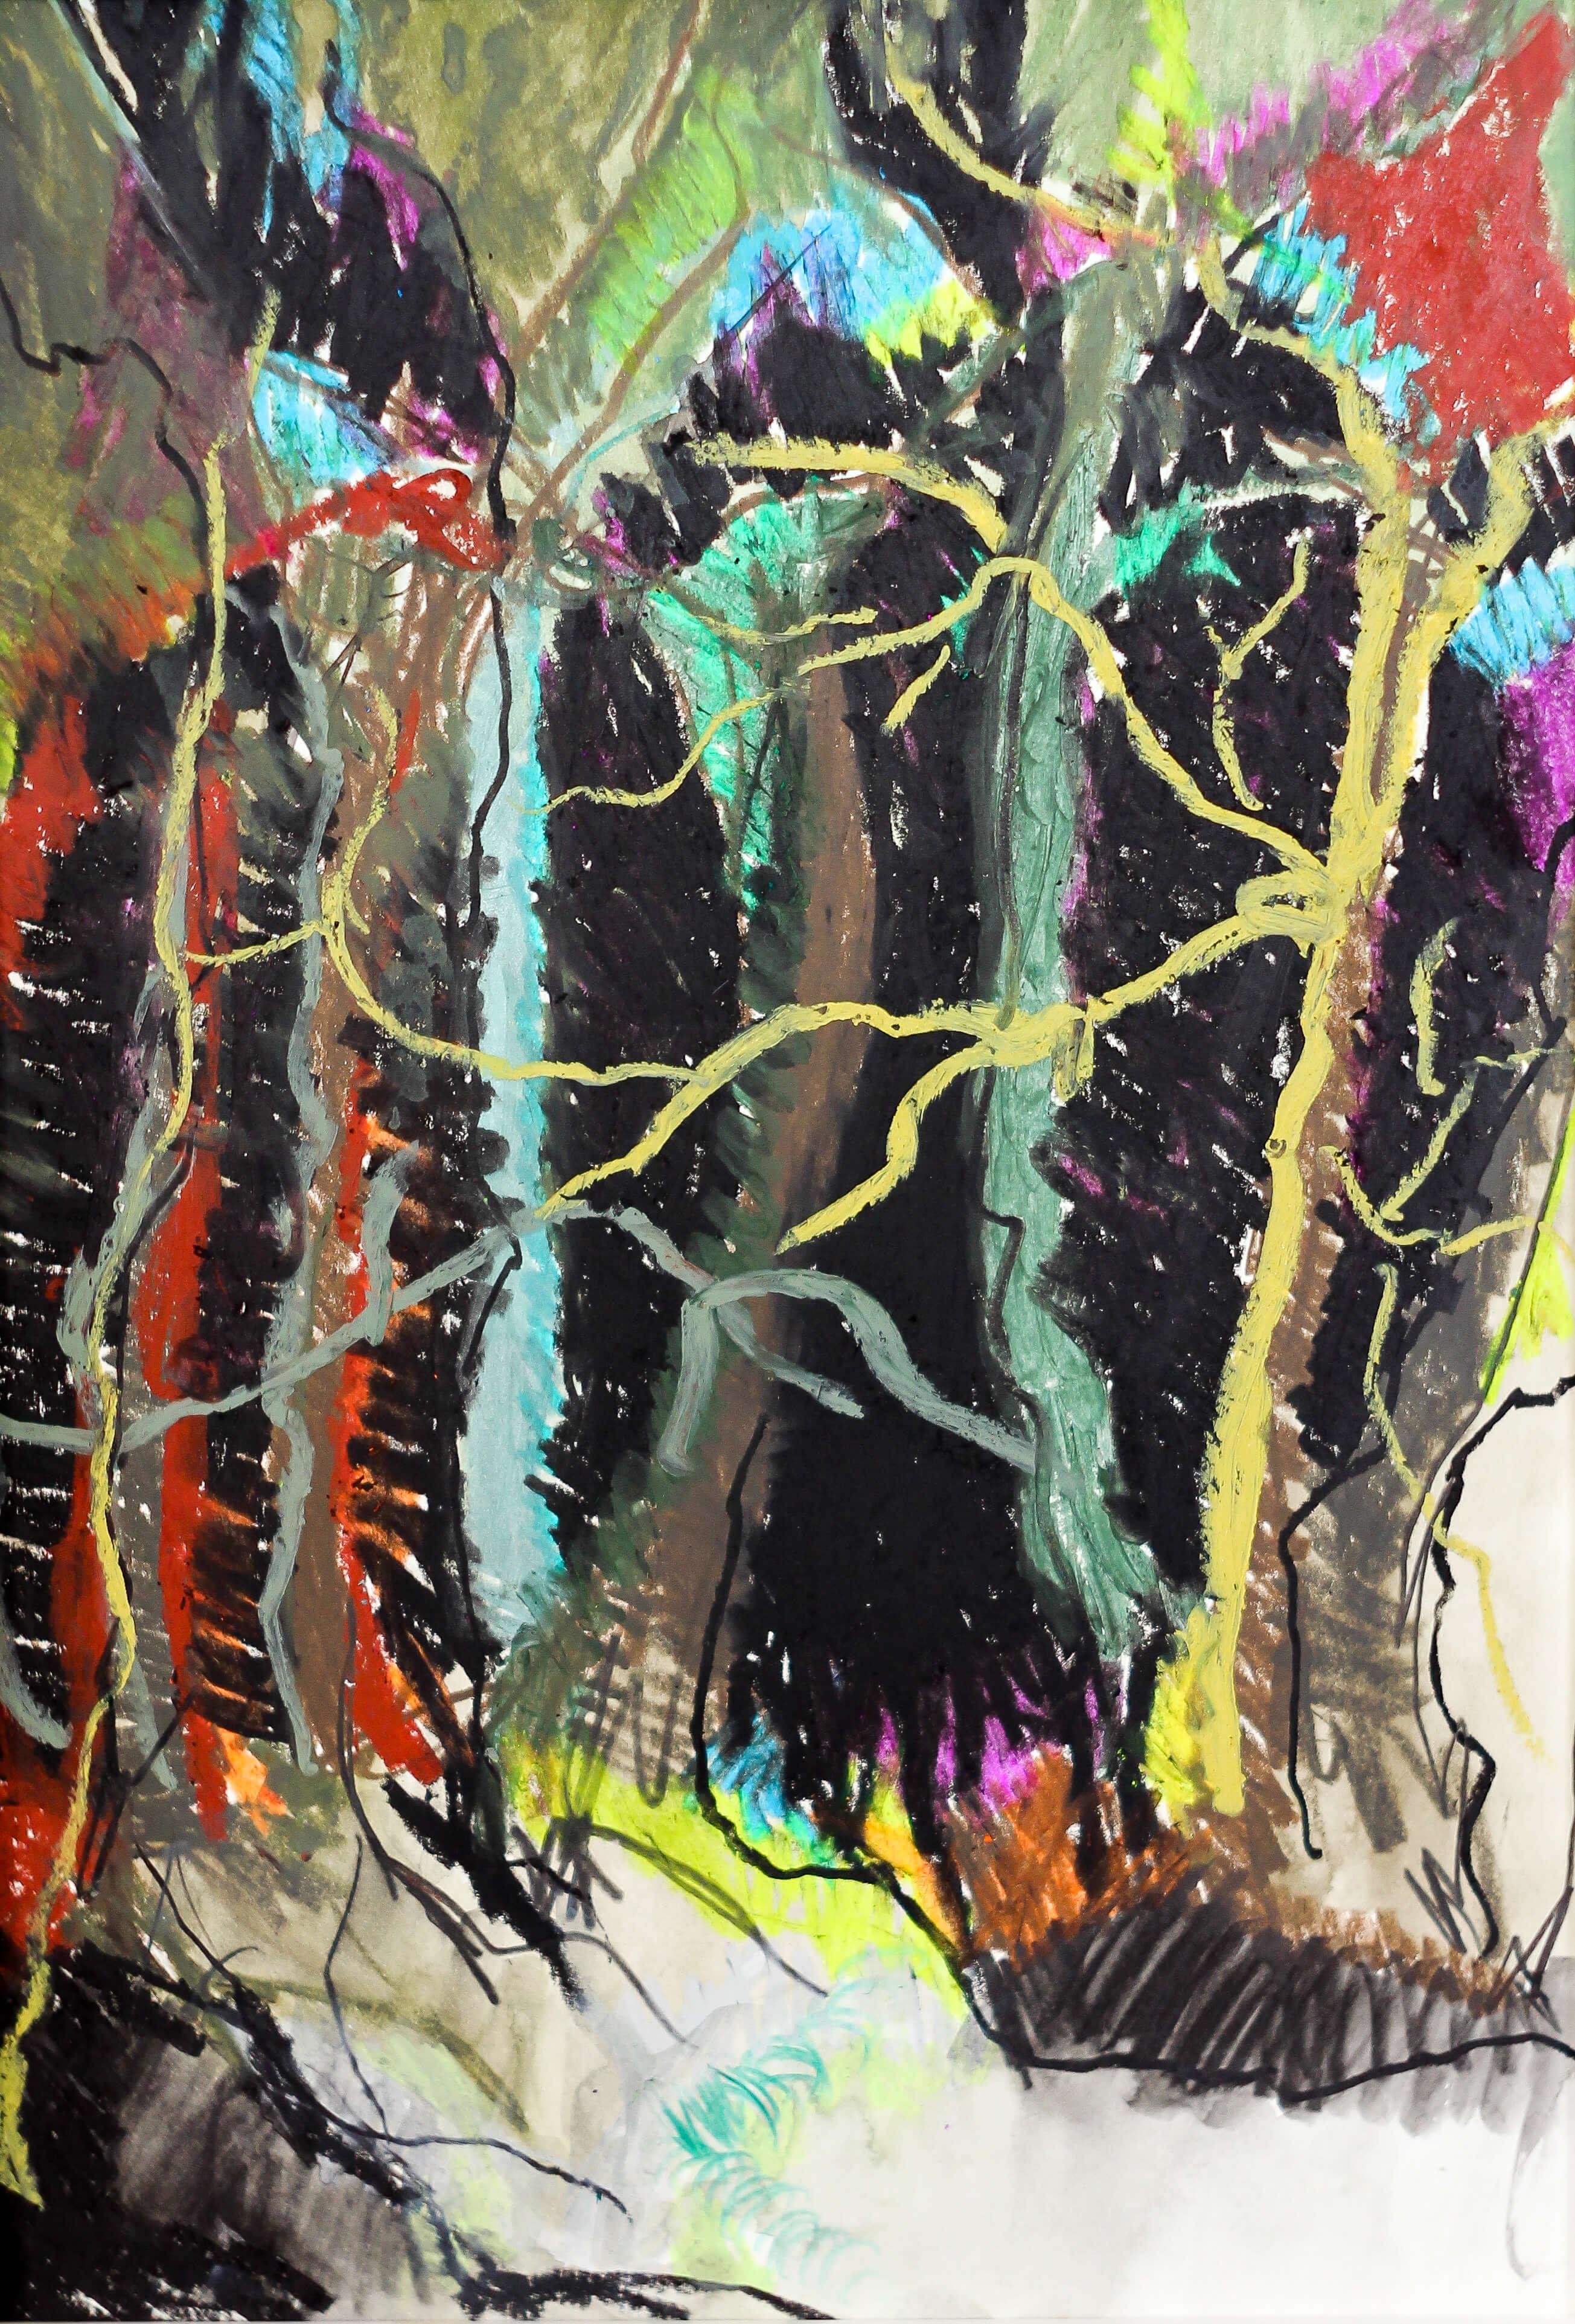 Katharina Albers, Wald IV, 2014, Ölkreide, Tusche, Aquarell, Graphit auf Papier, 29,7×21 cm